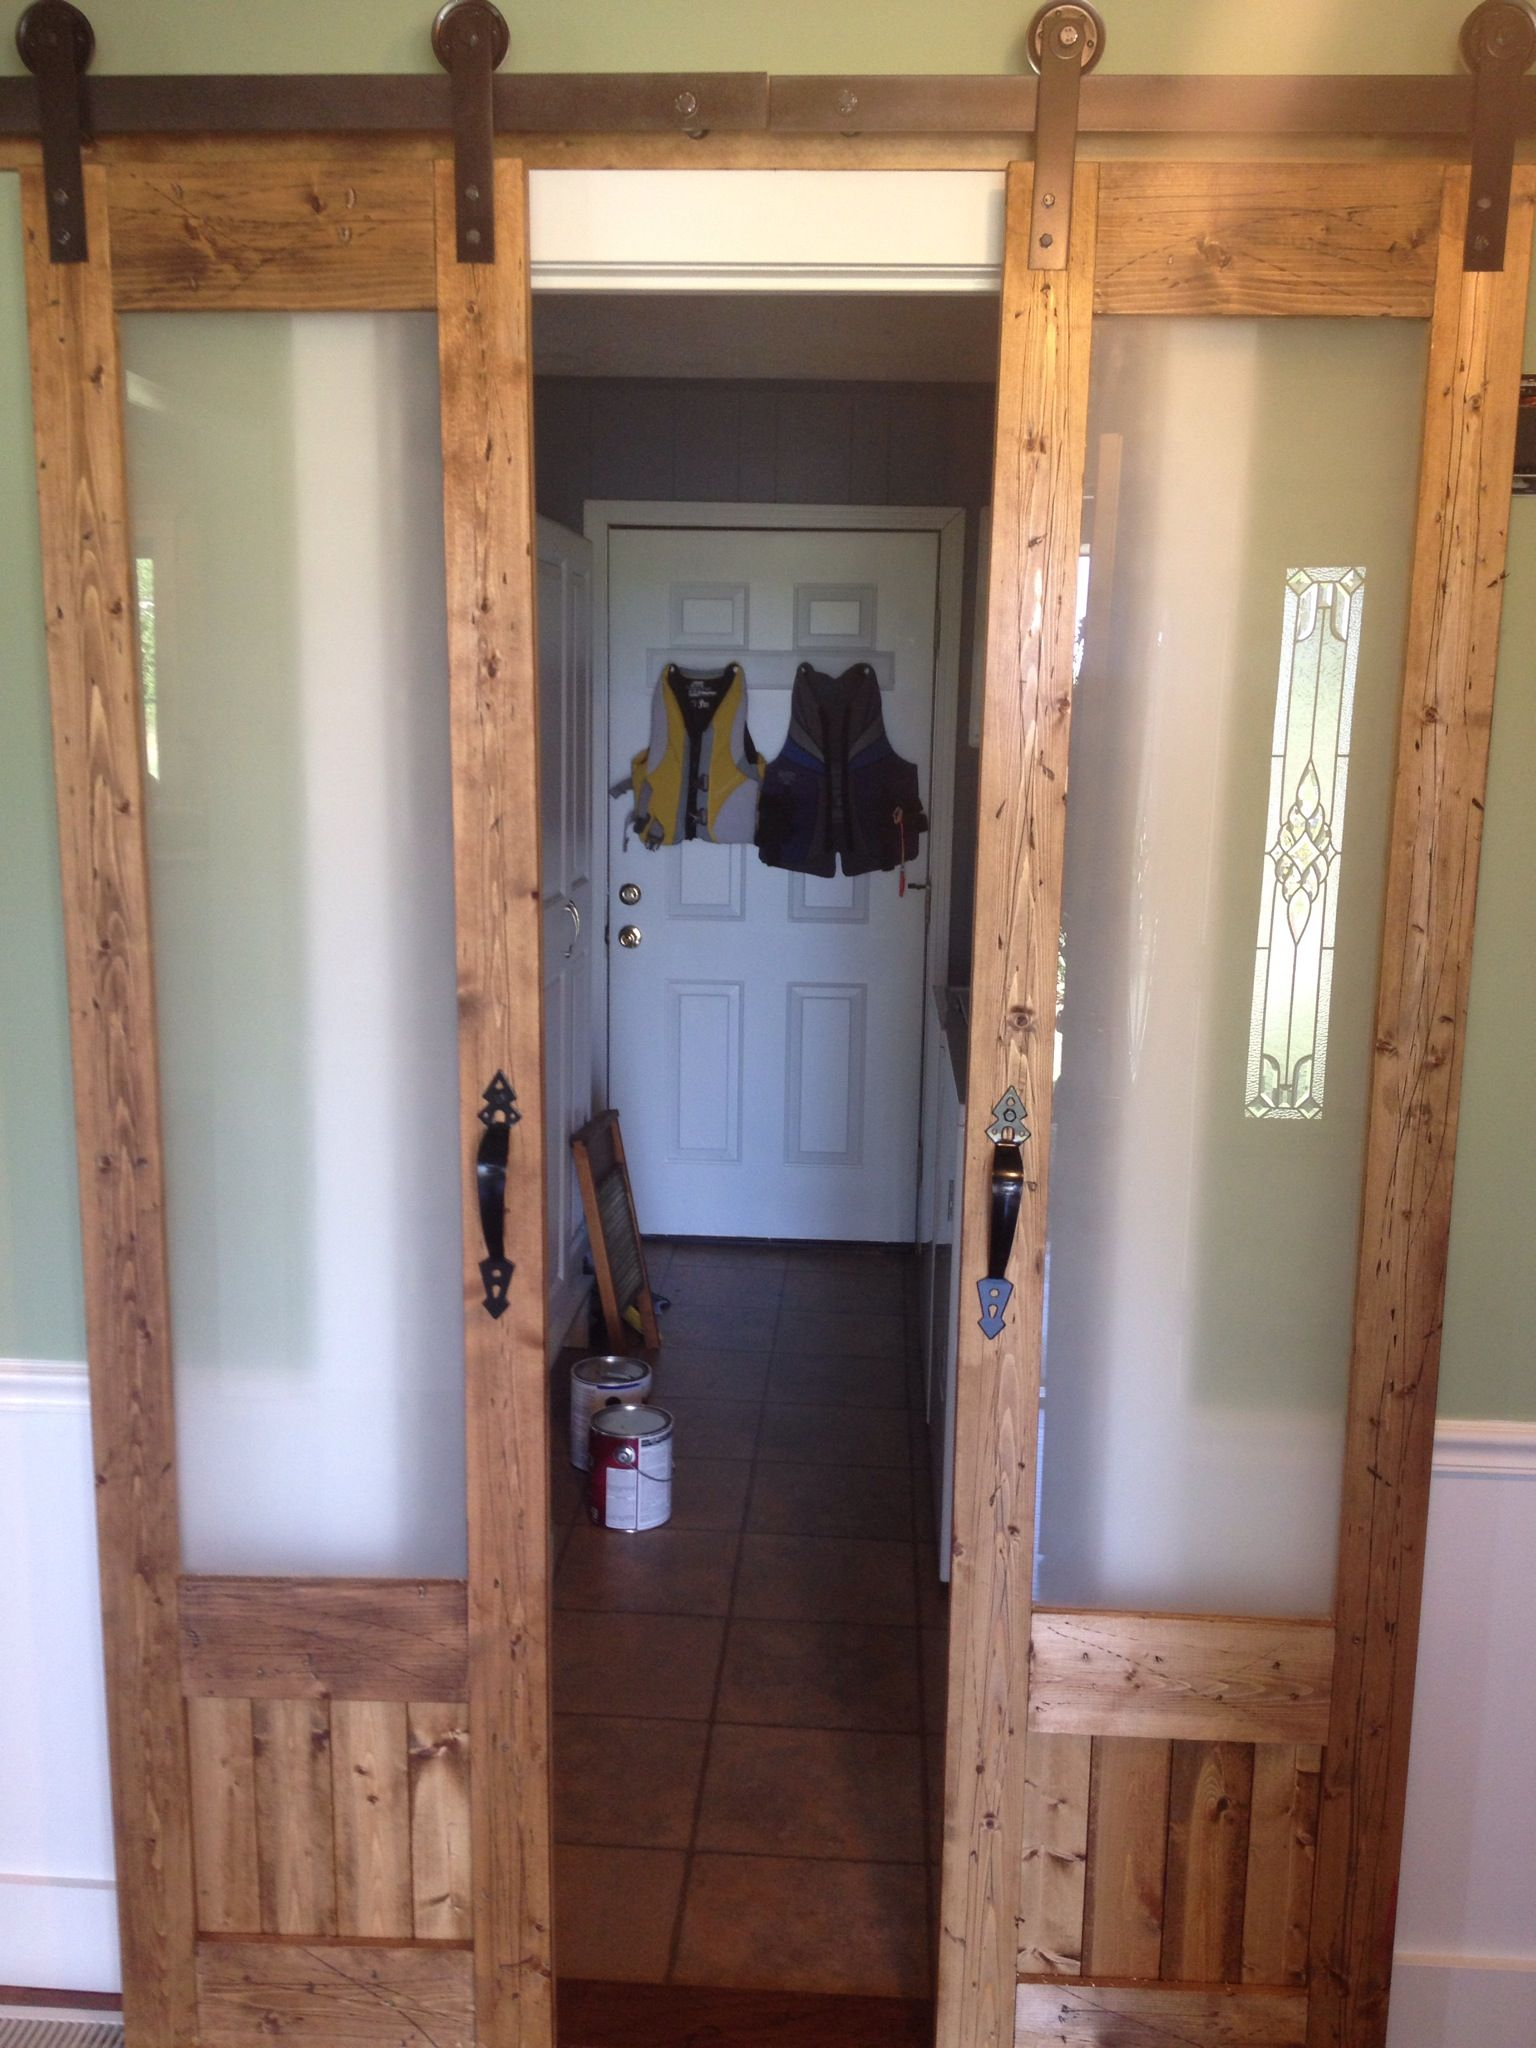 Dress Up The Mess Sliding Doors To Laundry Room Puertas Corredizas De Interiores Puertas Interiores Puertas De Banos